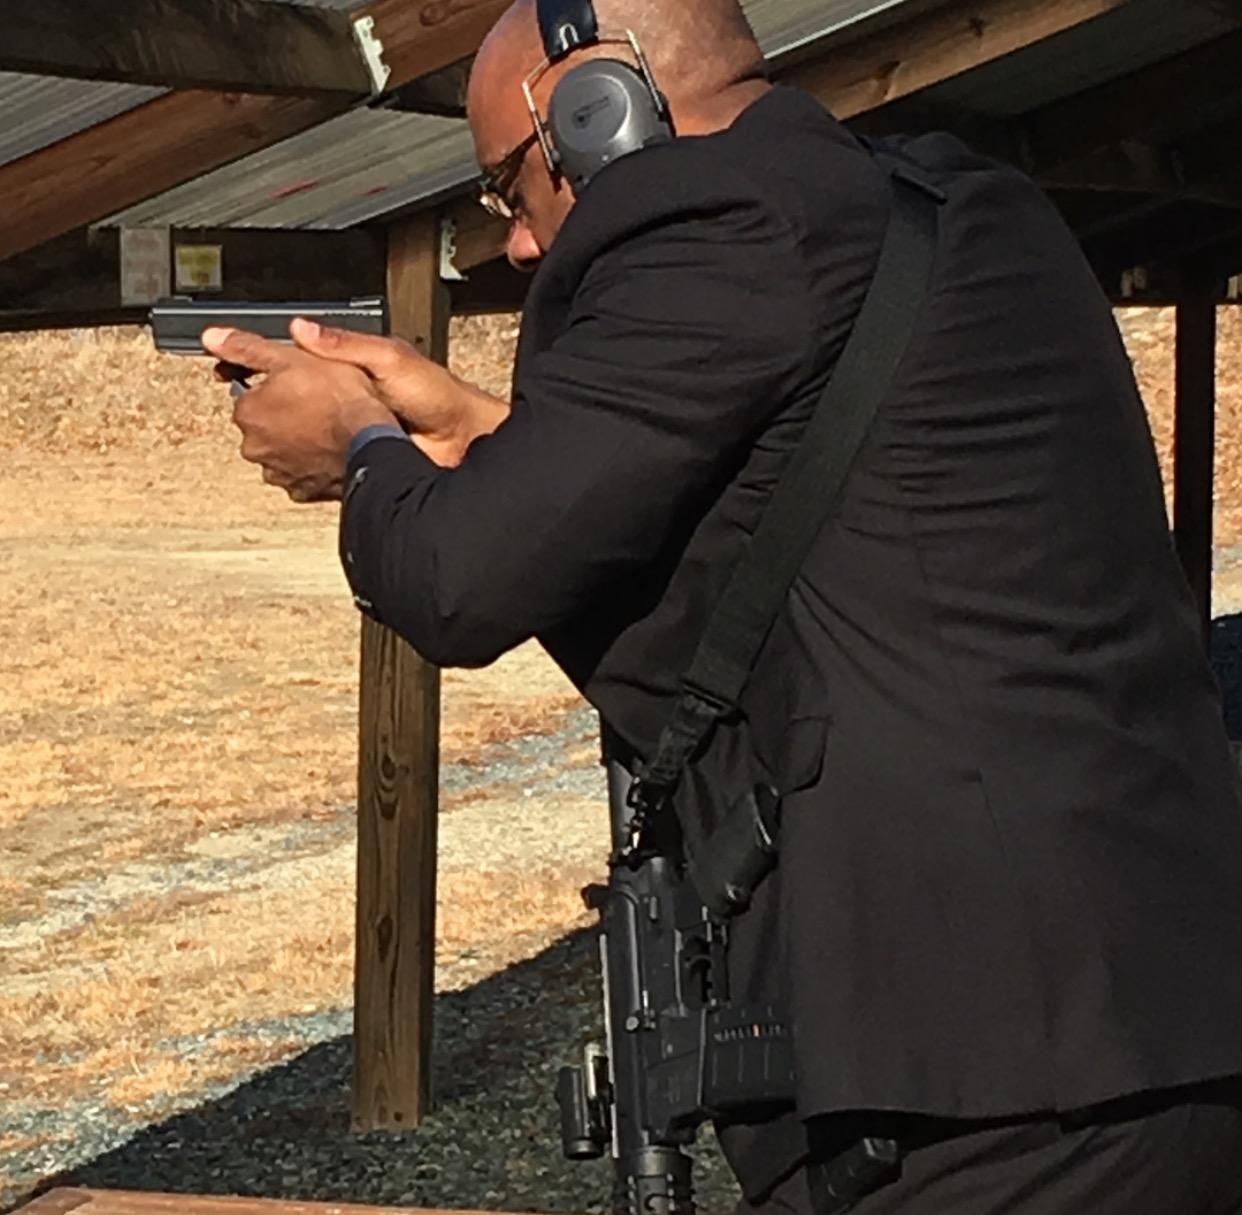 Training Enforcement Executive Law Protection